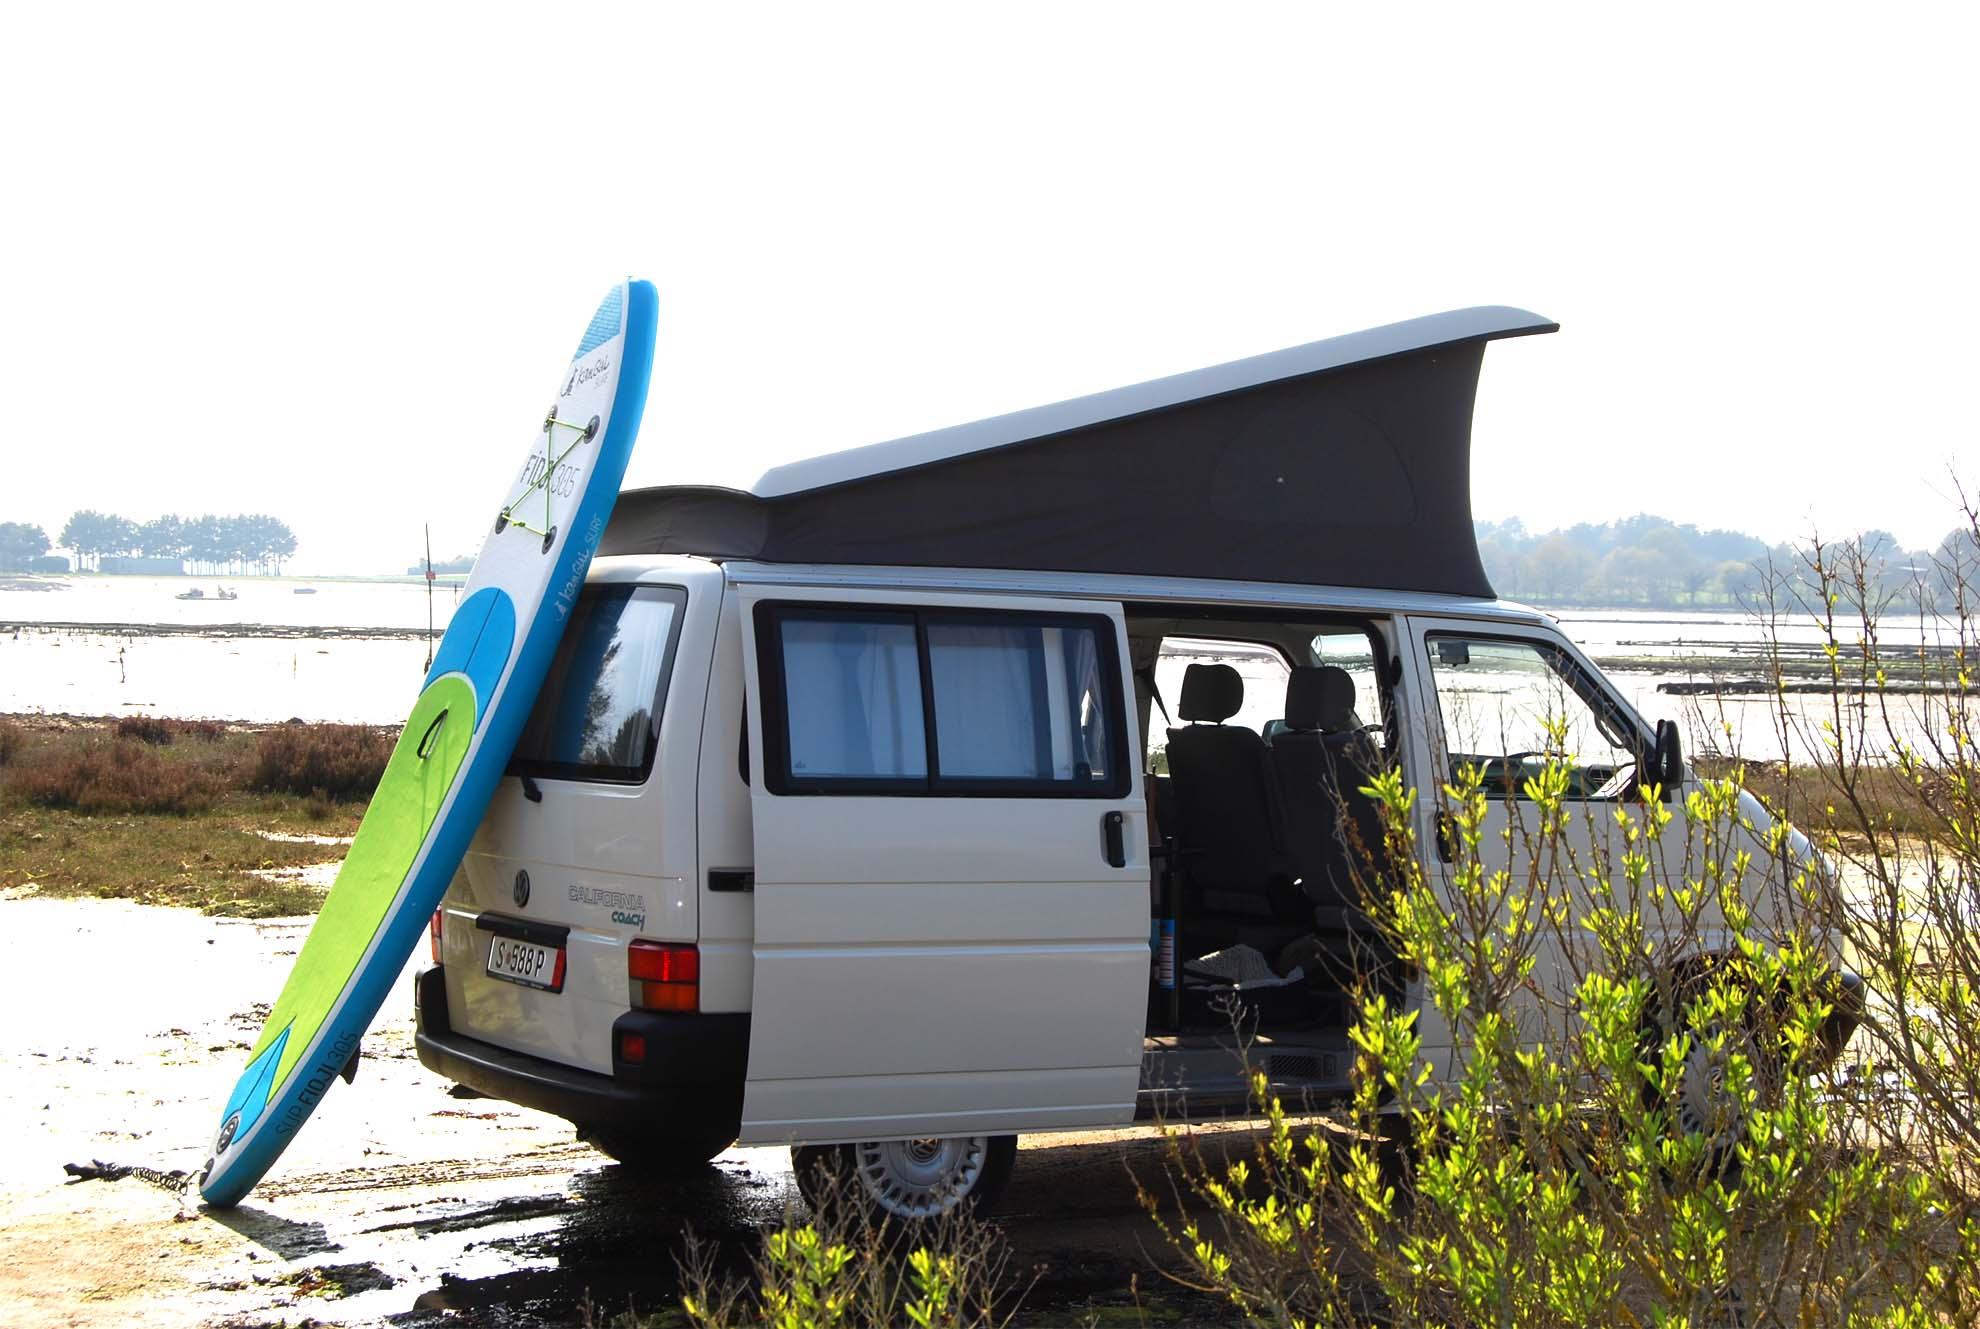 van aménagé sur plage bretonne - Breizh Wagen - Lorient (Morbihan)